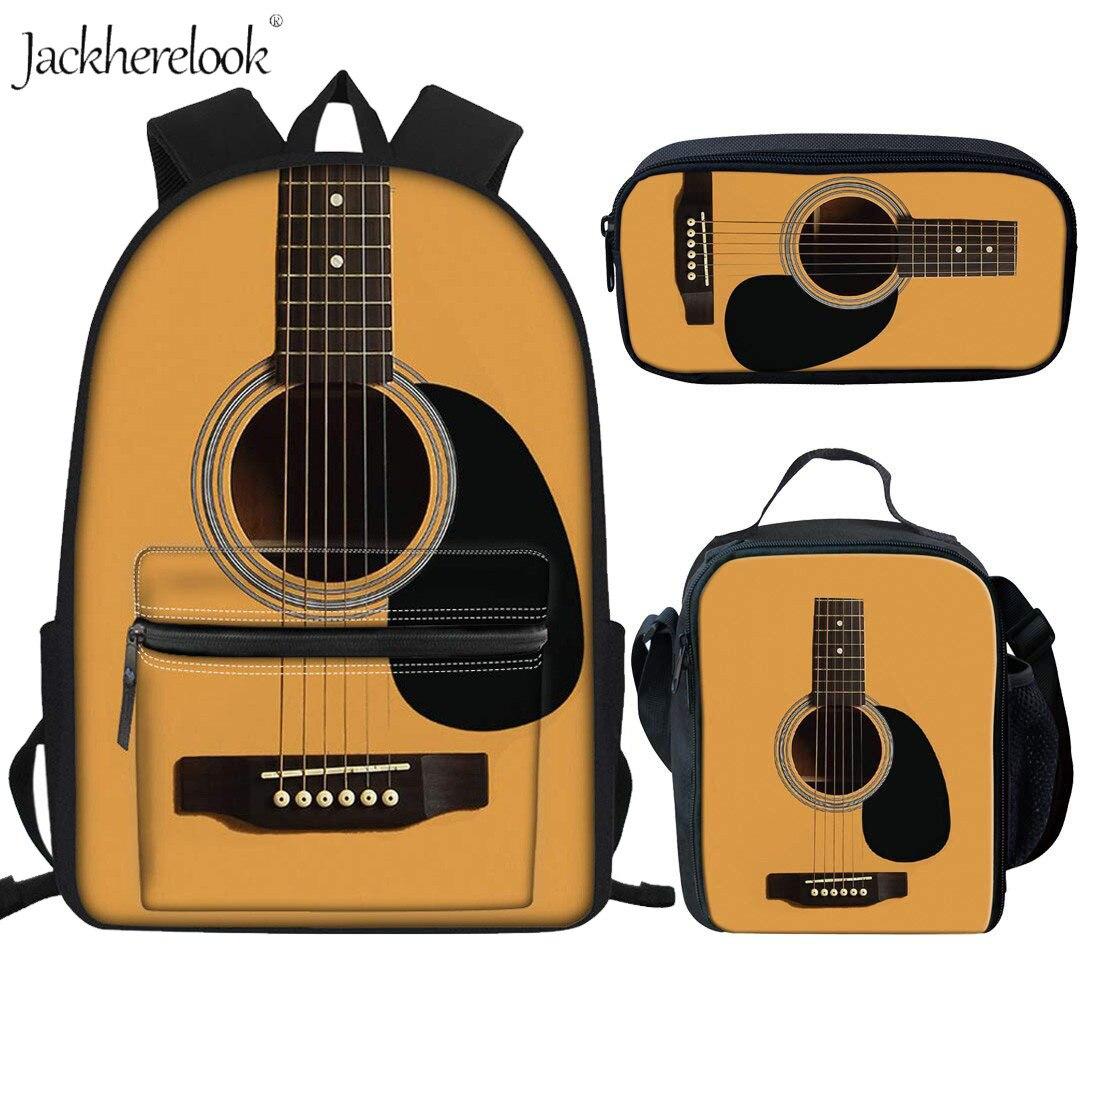 3Pcs Kids School Bags Set Music Note Guitar Panio Keyboard Printing Canvas Backpacks For Girls Boys Waterproof Student Bookbags